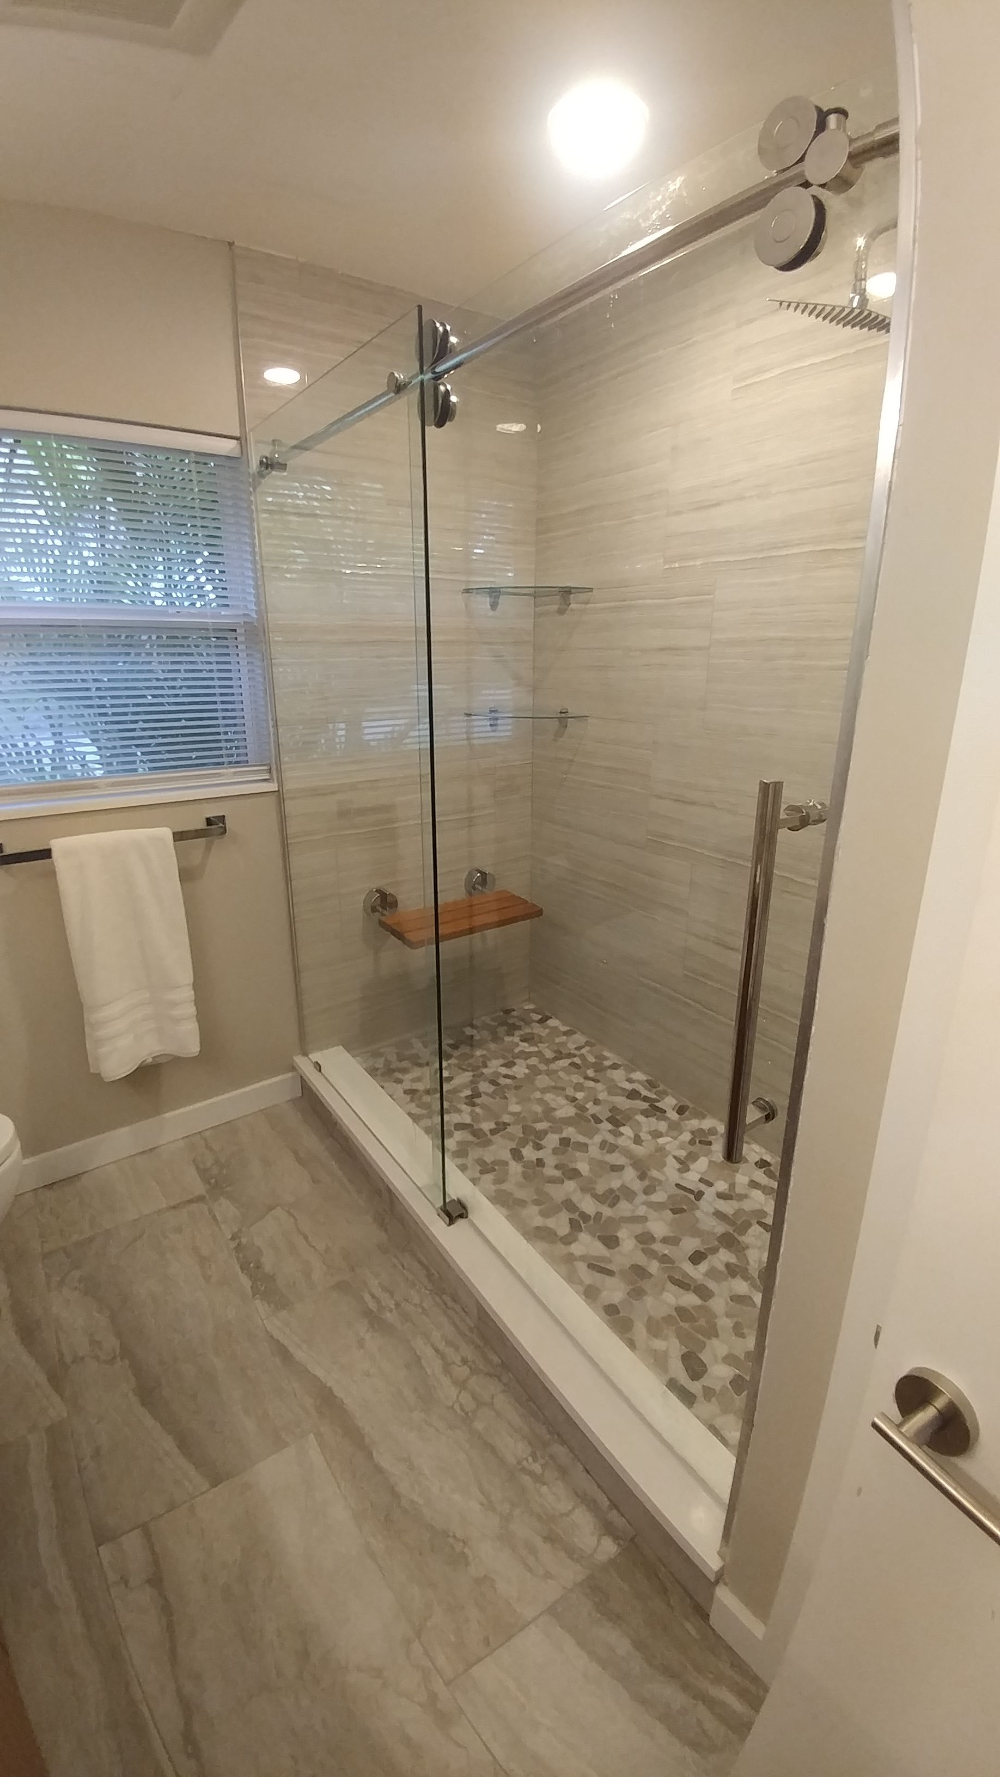 Sliding Glass Shower Door Built In Bench Google Search In 2020 Patterned Bathroom Tiles Shower Sliding Glass Door Shower Doors